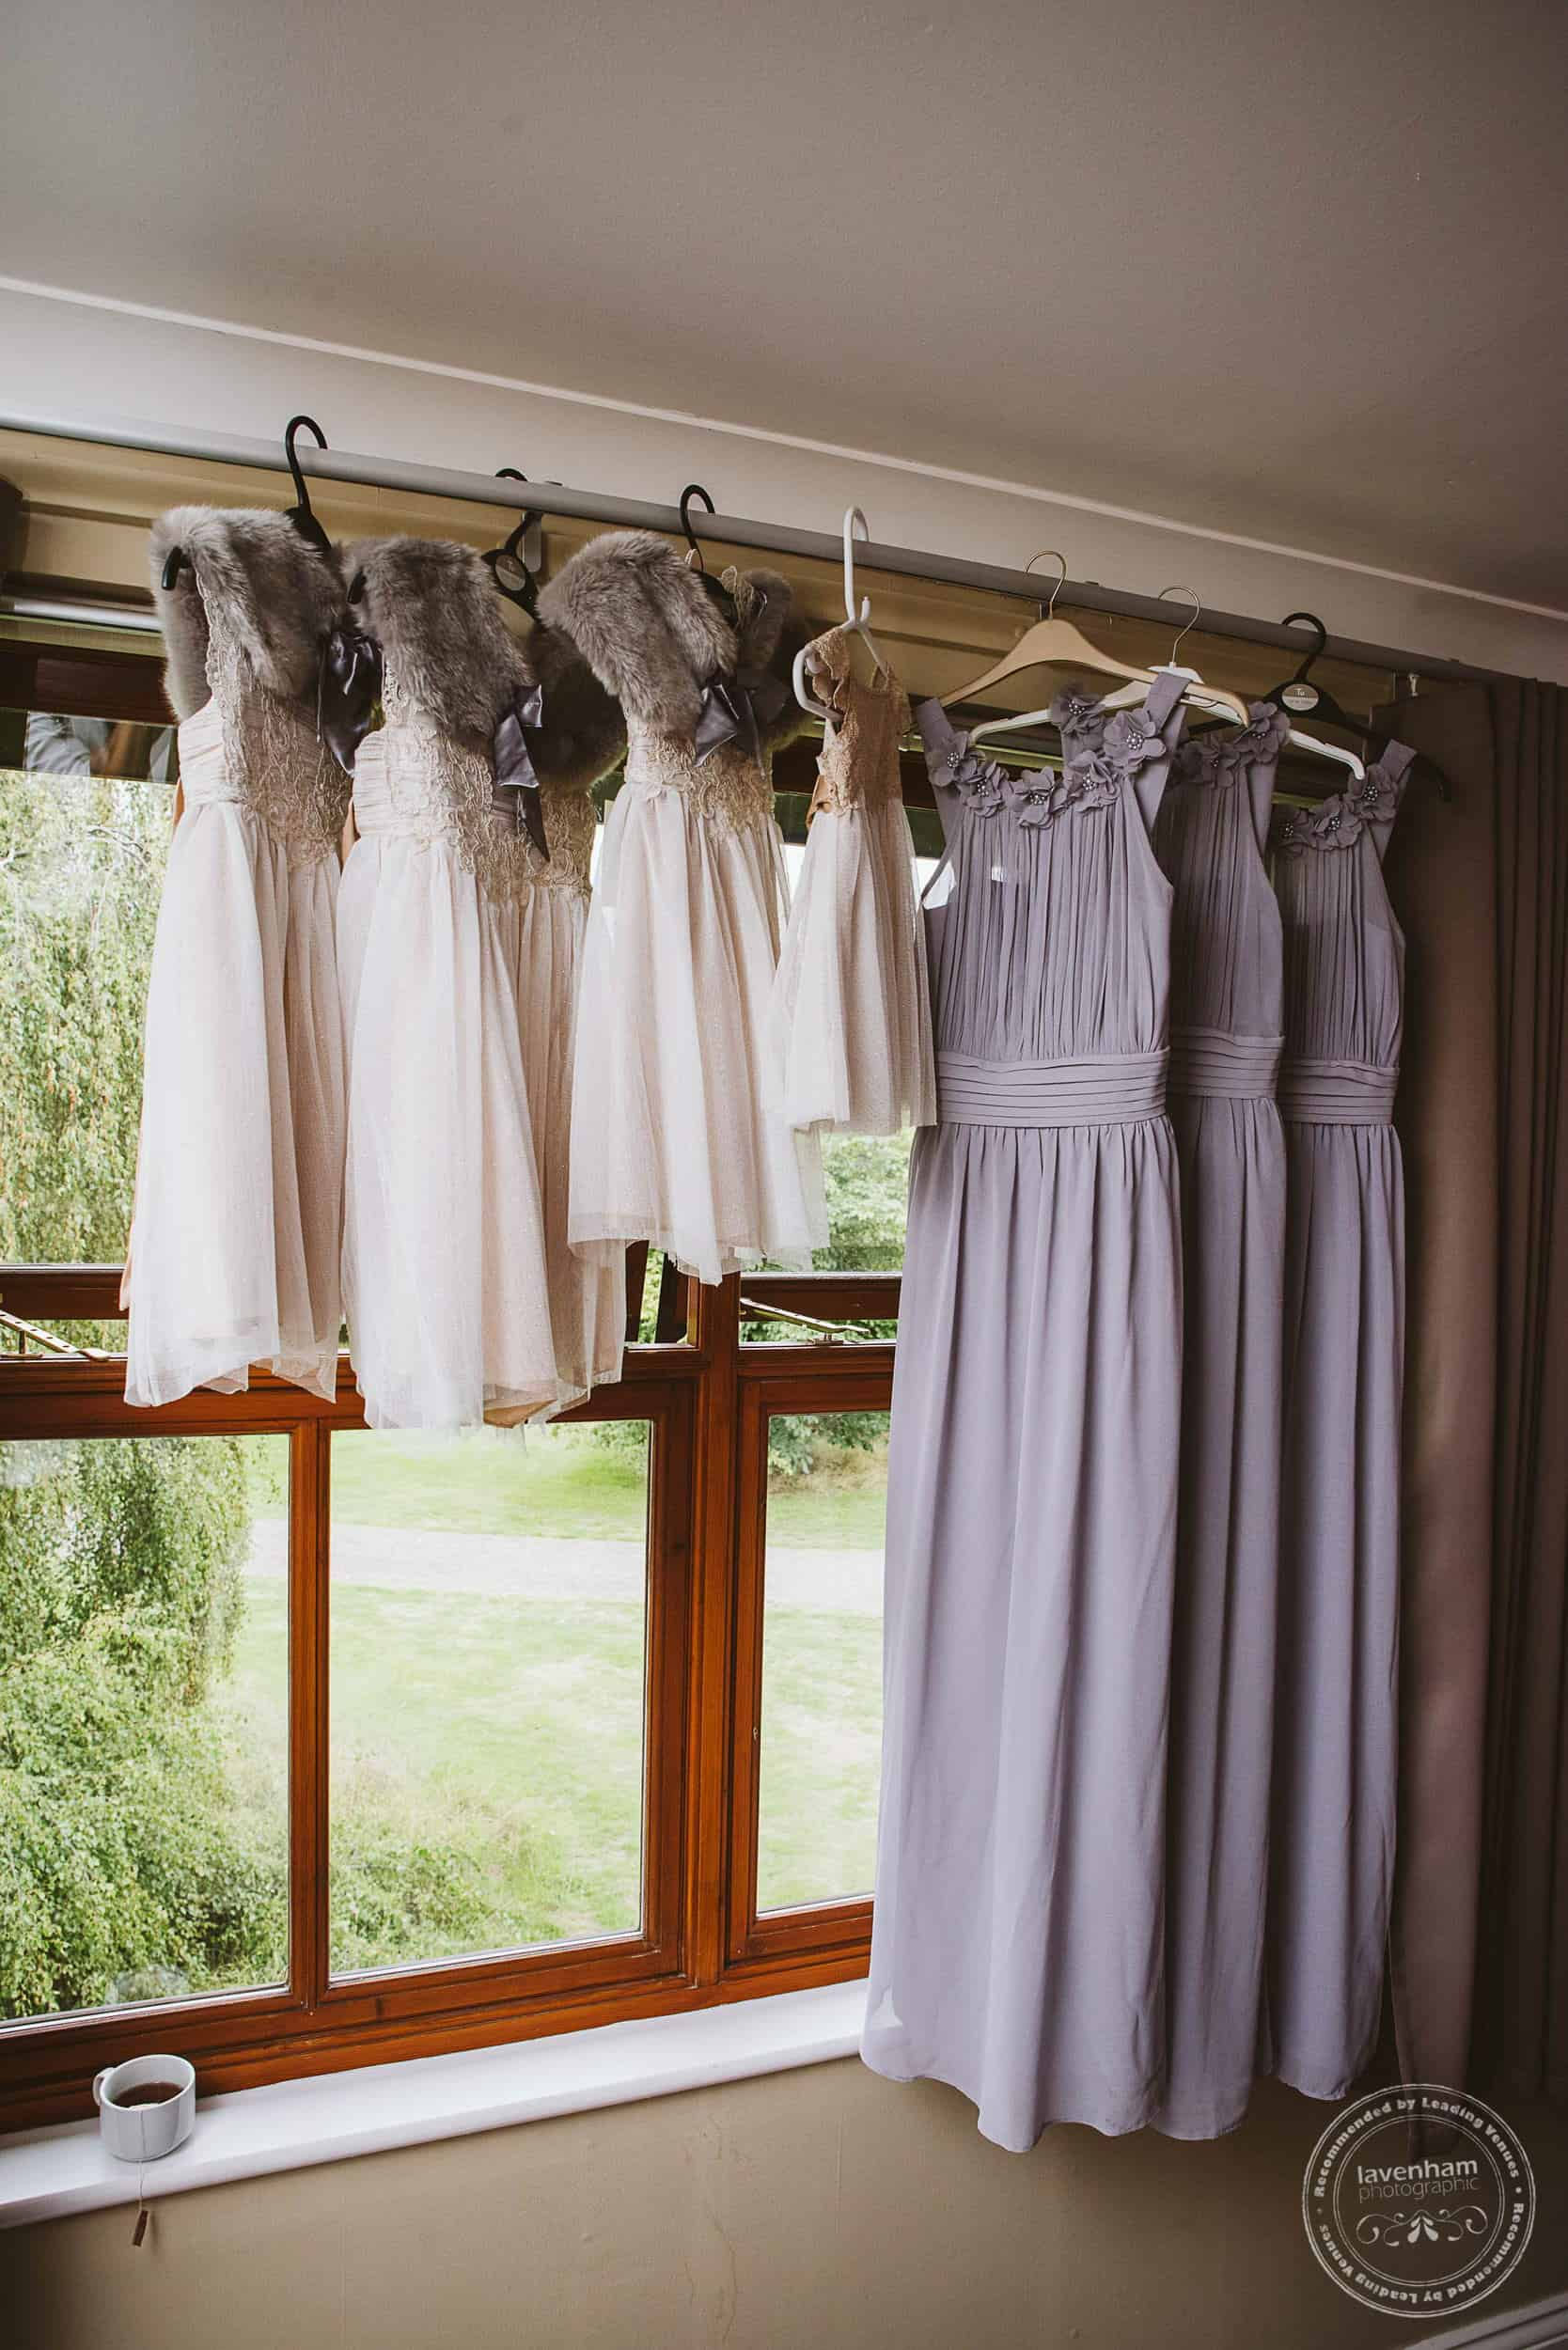 180818 Marks Hall Wedding Photography Lavenham Photographic 008